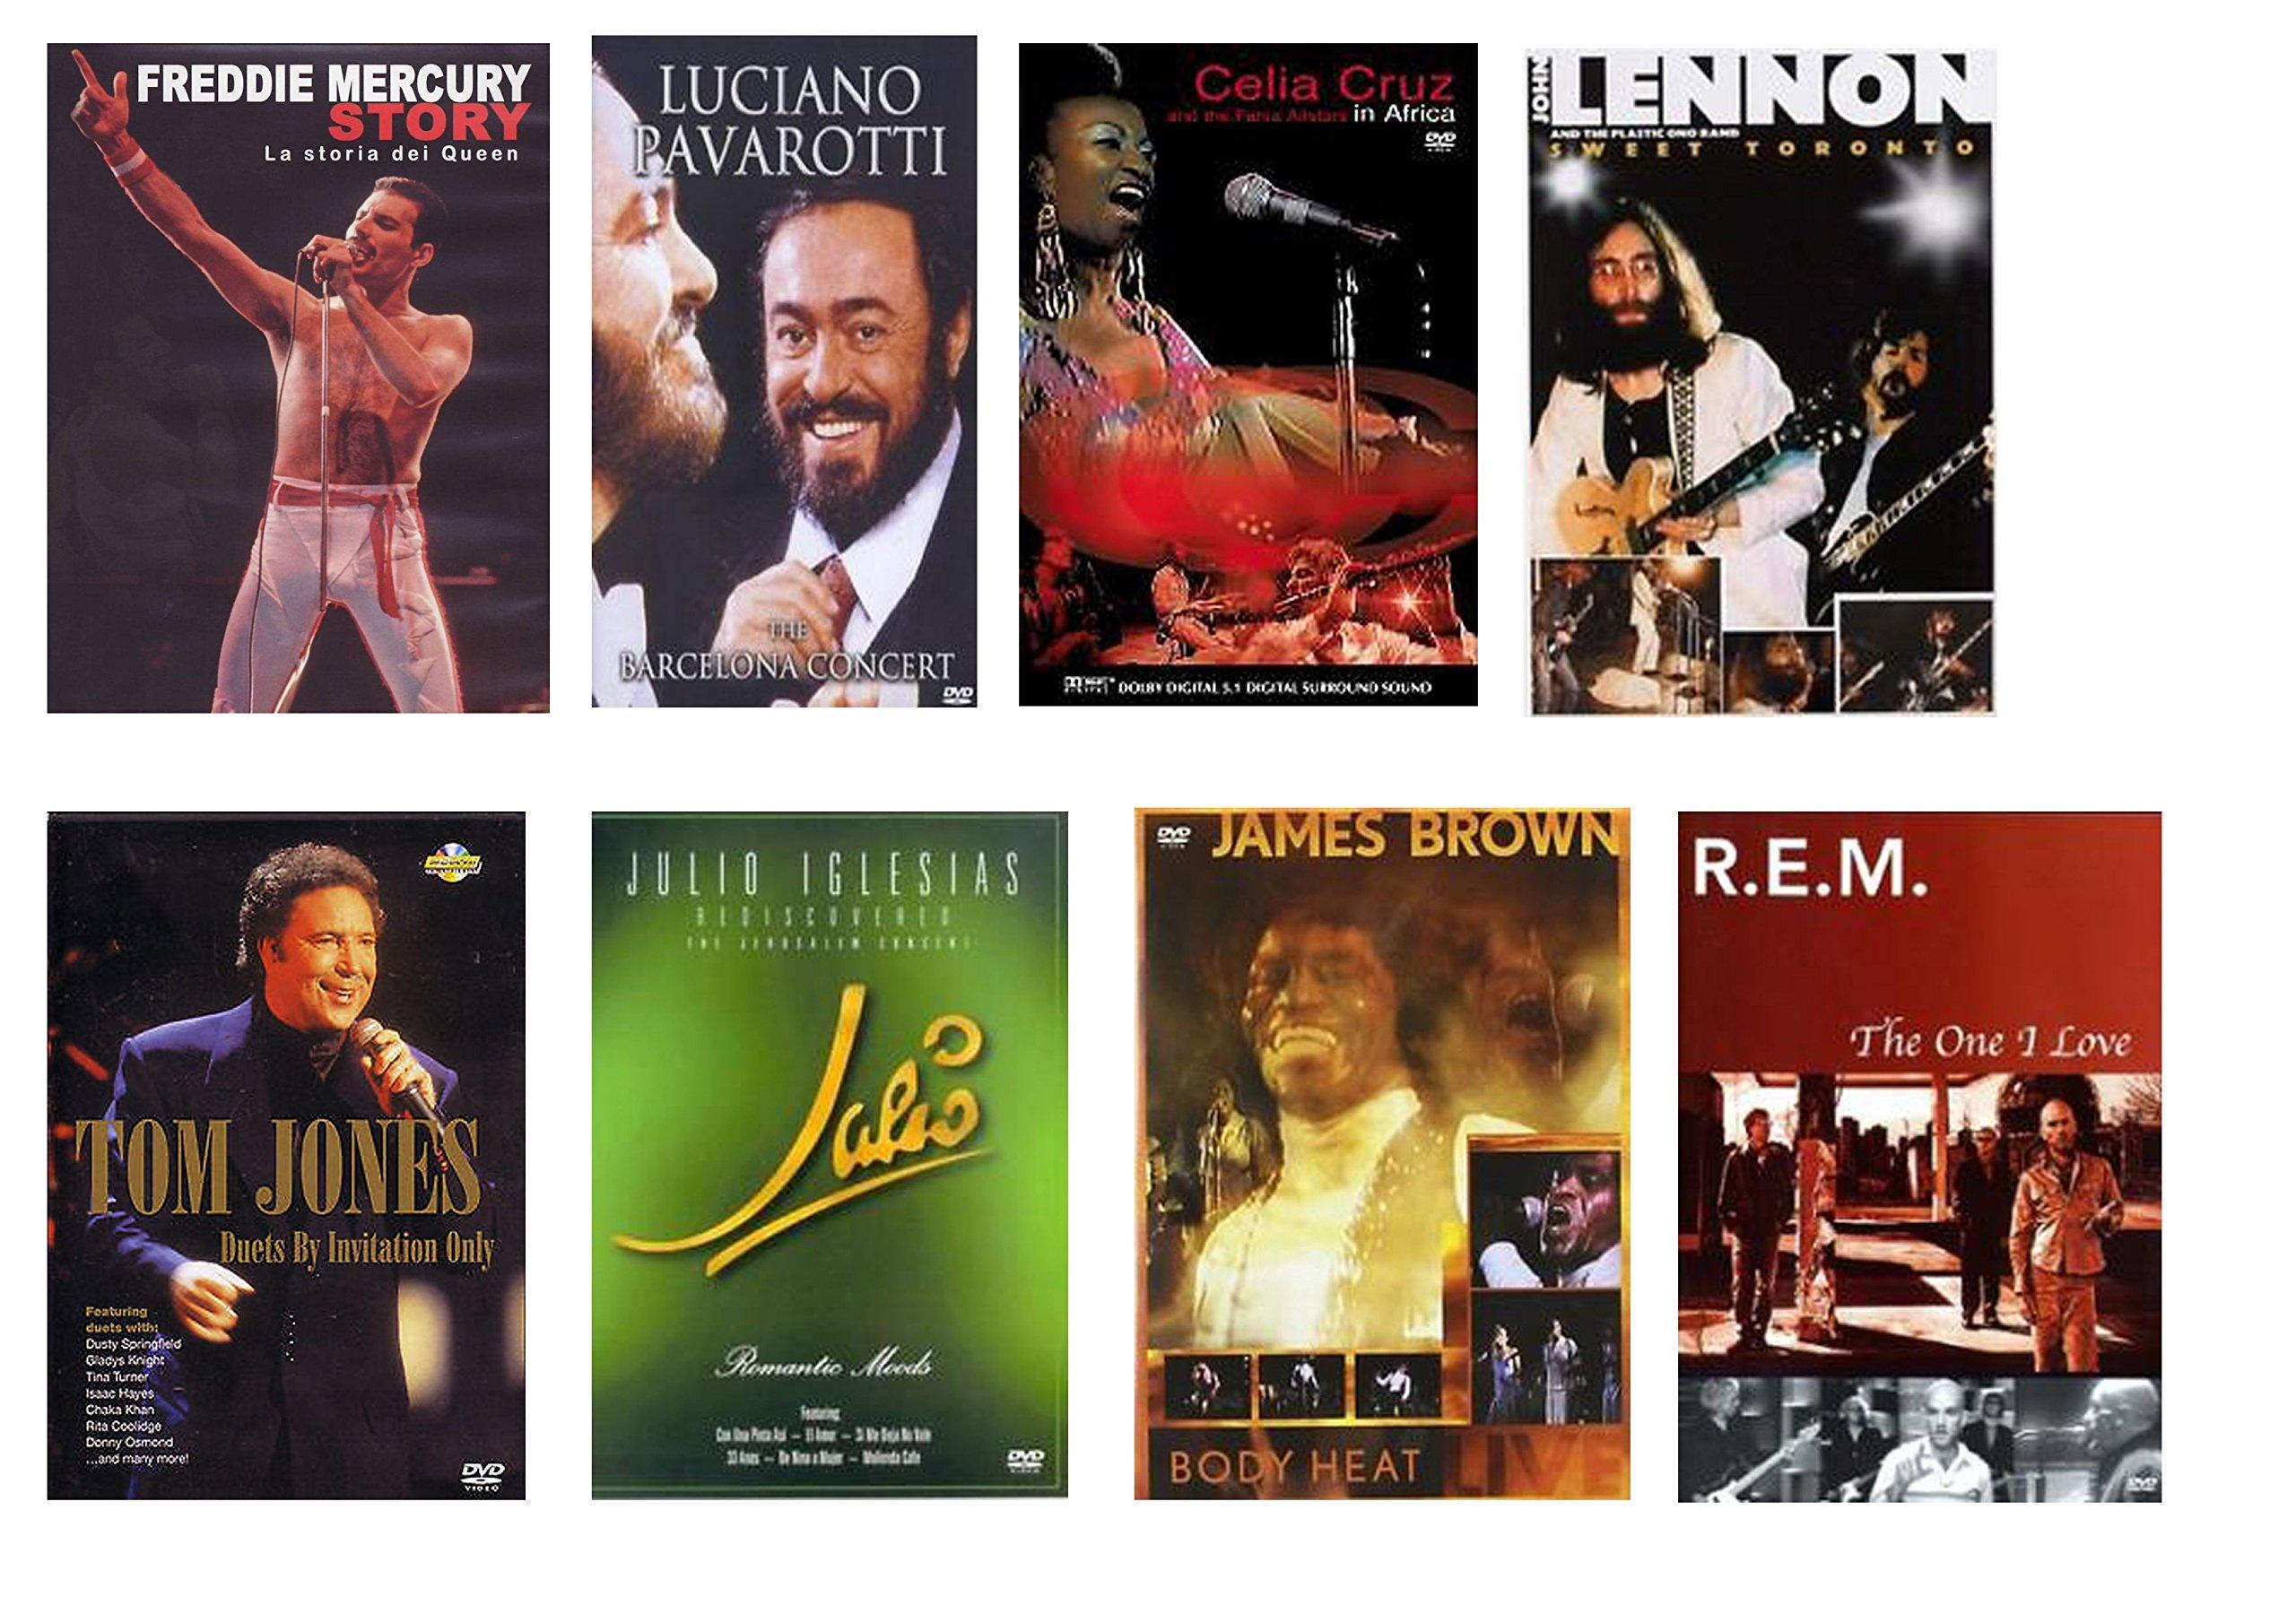 Special Offer 8 Concertos DVD Freedie Mercury, John Lennon, Luciano Pavarotti, James Brown, Julia I